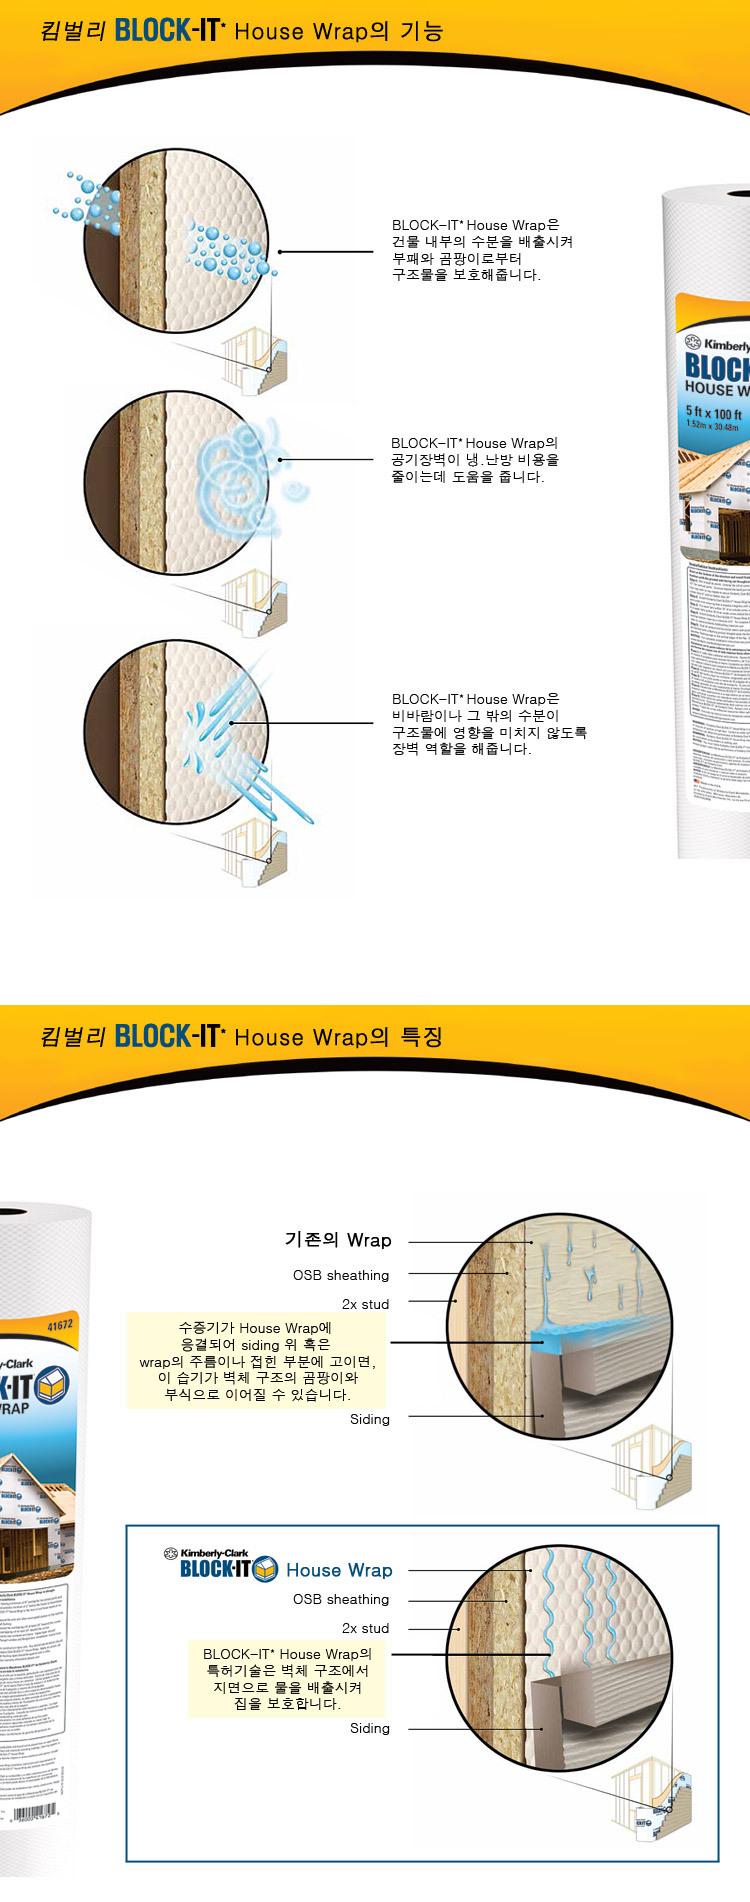 ube14 ub7ed uc787 block